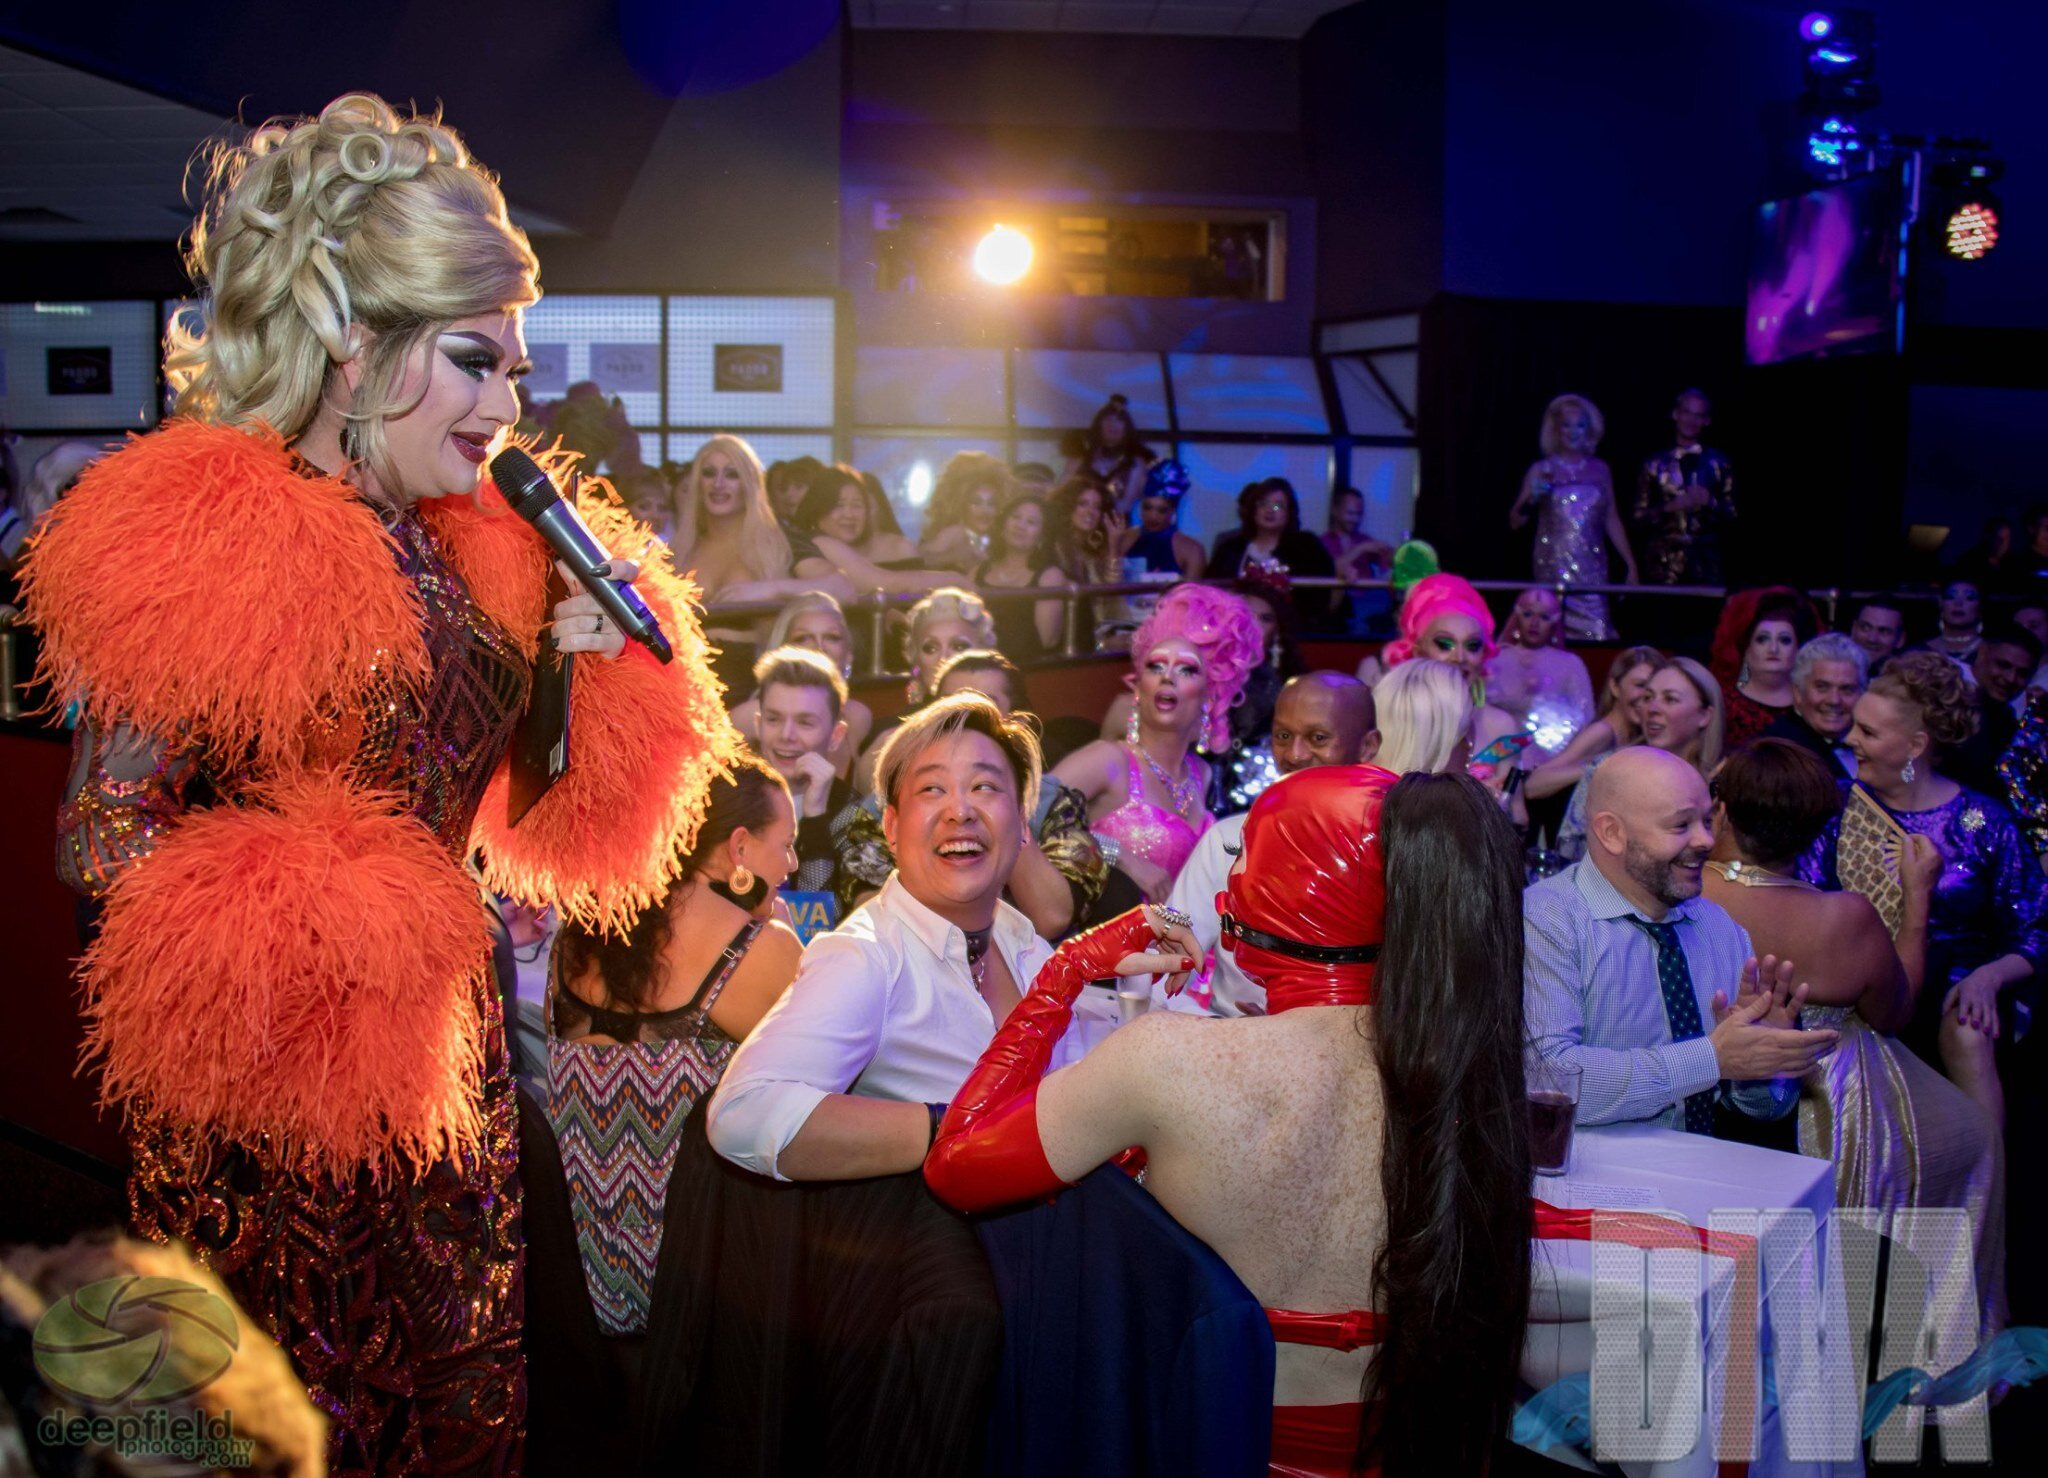 charisma-belle-corporate-host-event-hosting-diva-awards-sydney-drag-queen-royalty-best-hire-drag-race-australia.jpg